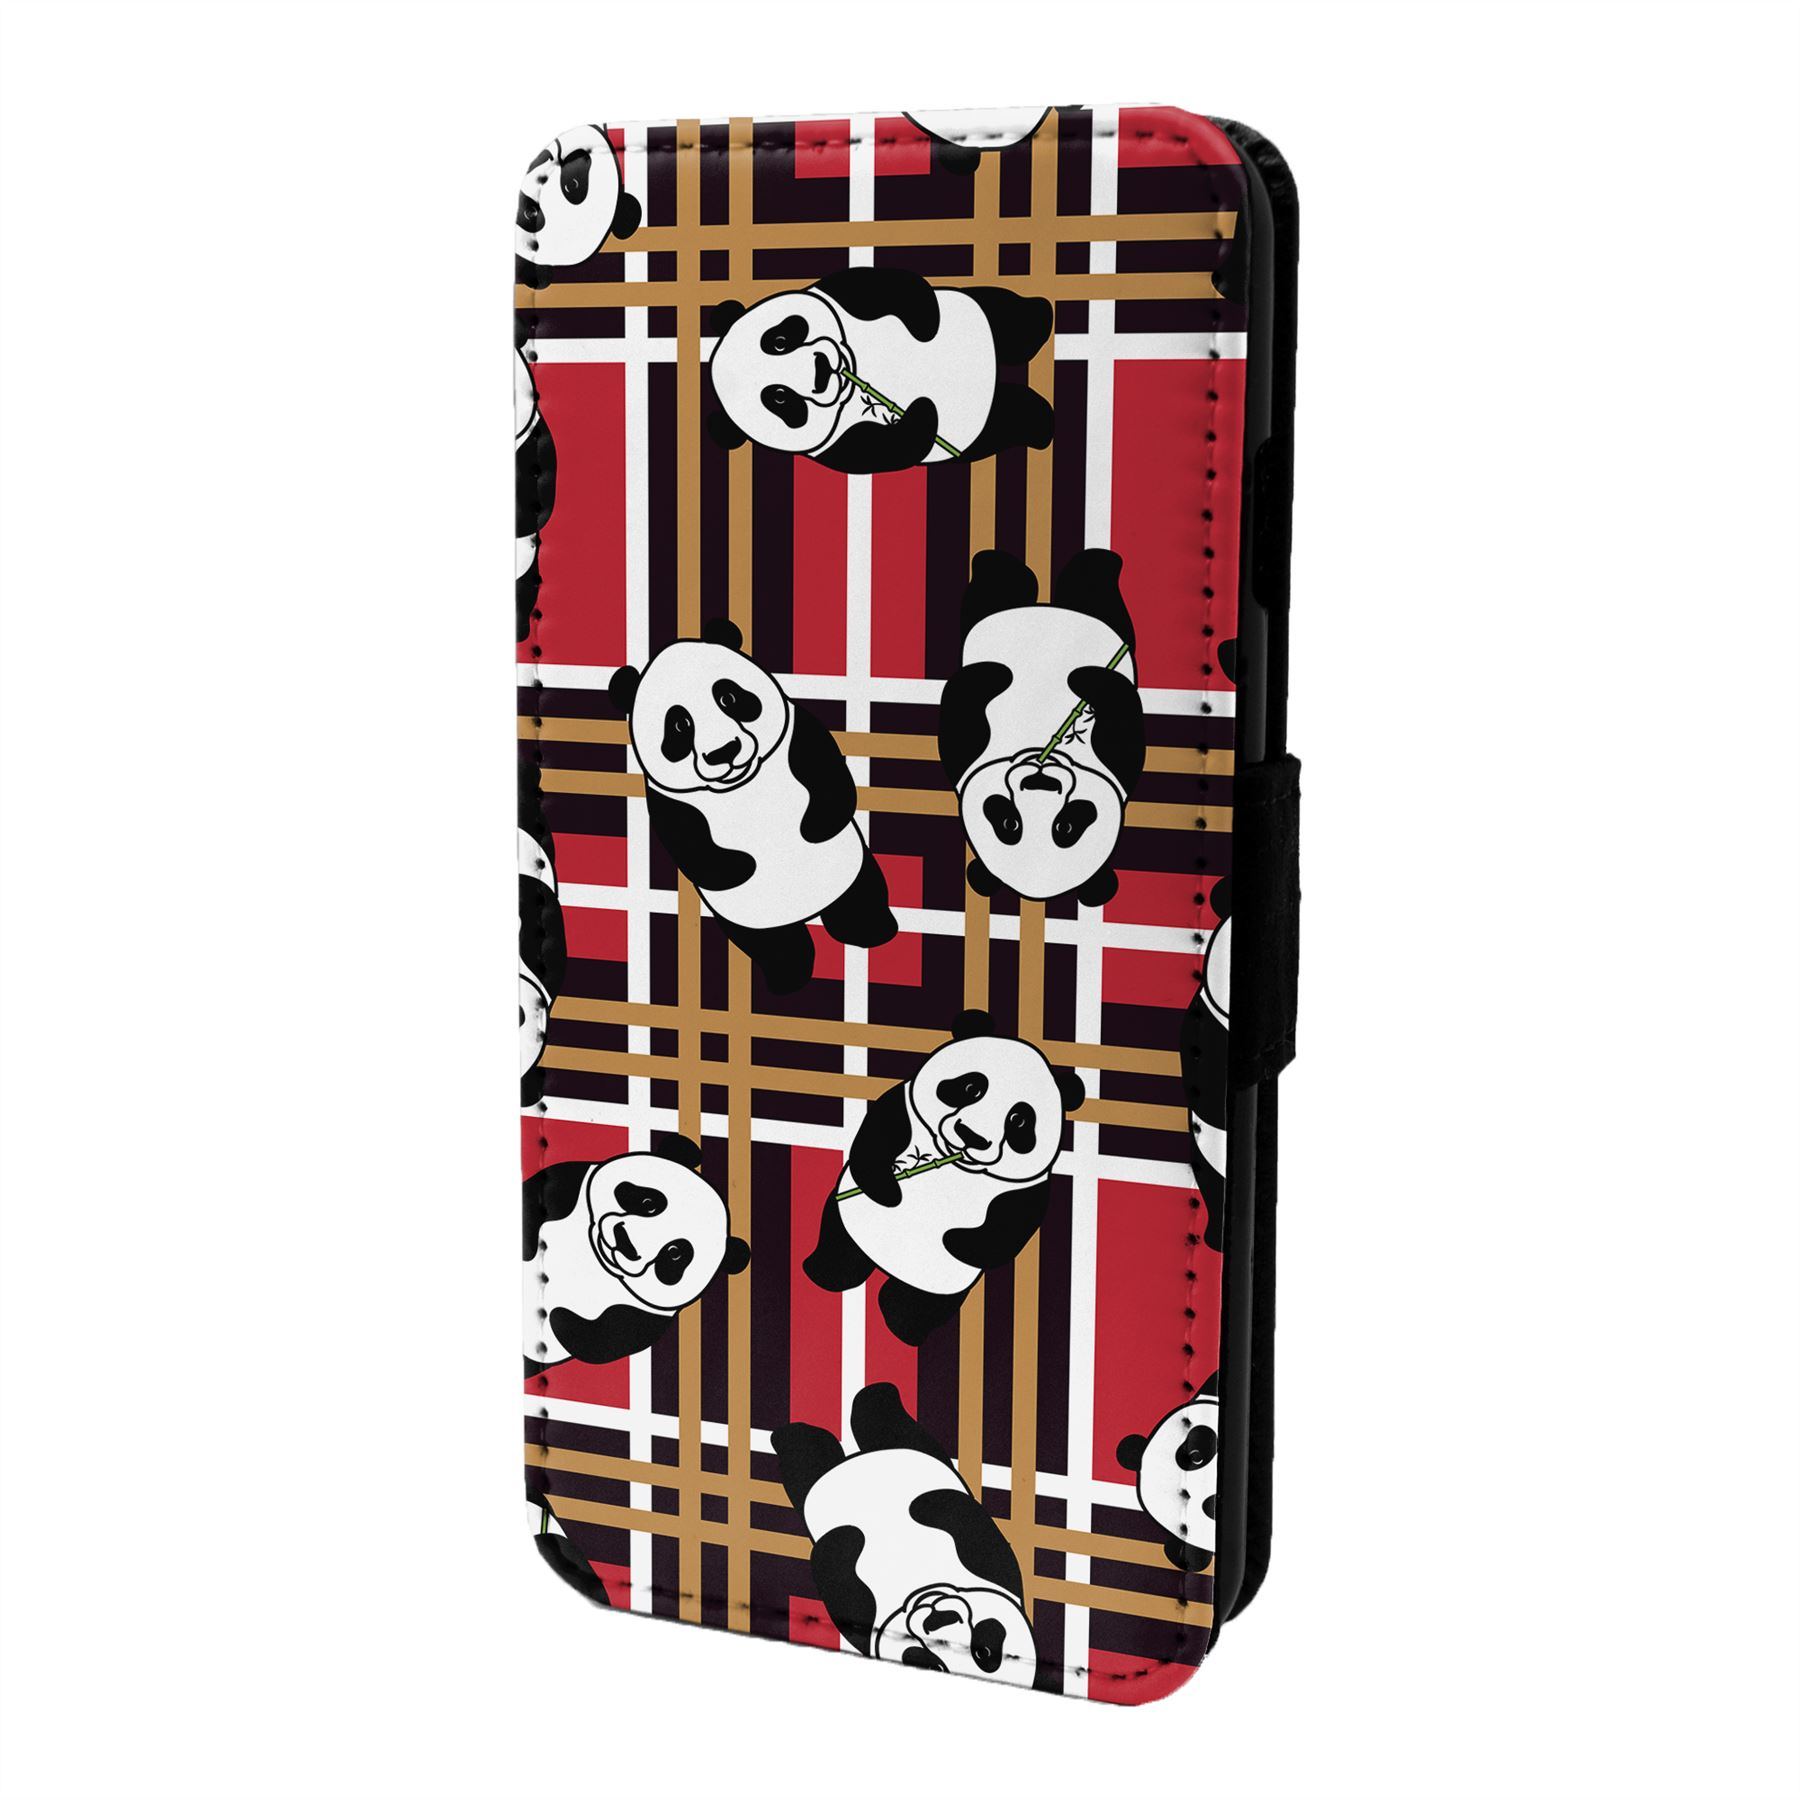 Panda-Motif-Etui-Rabattable-pour-Telephone-Portable-S6999